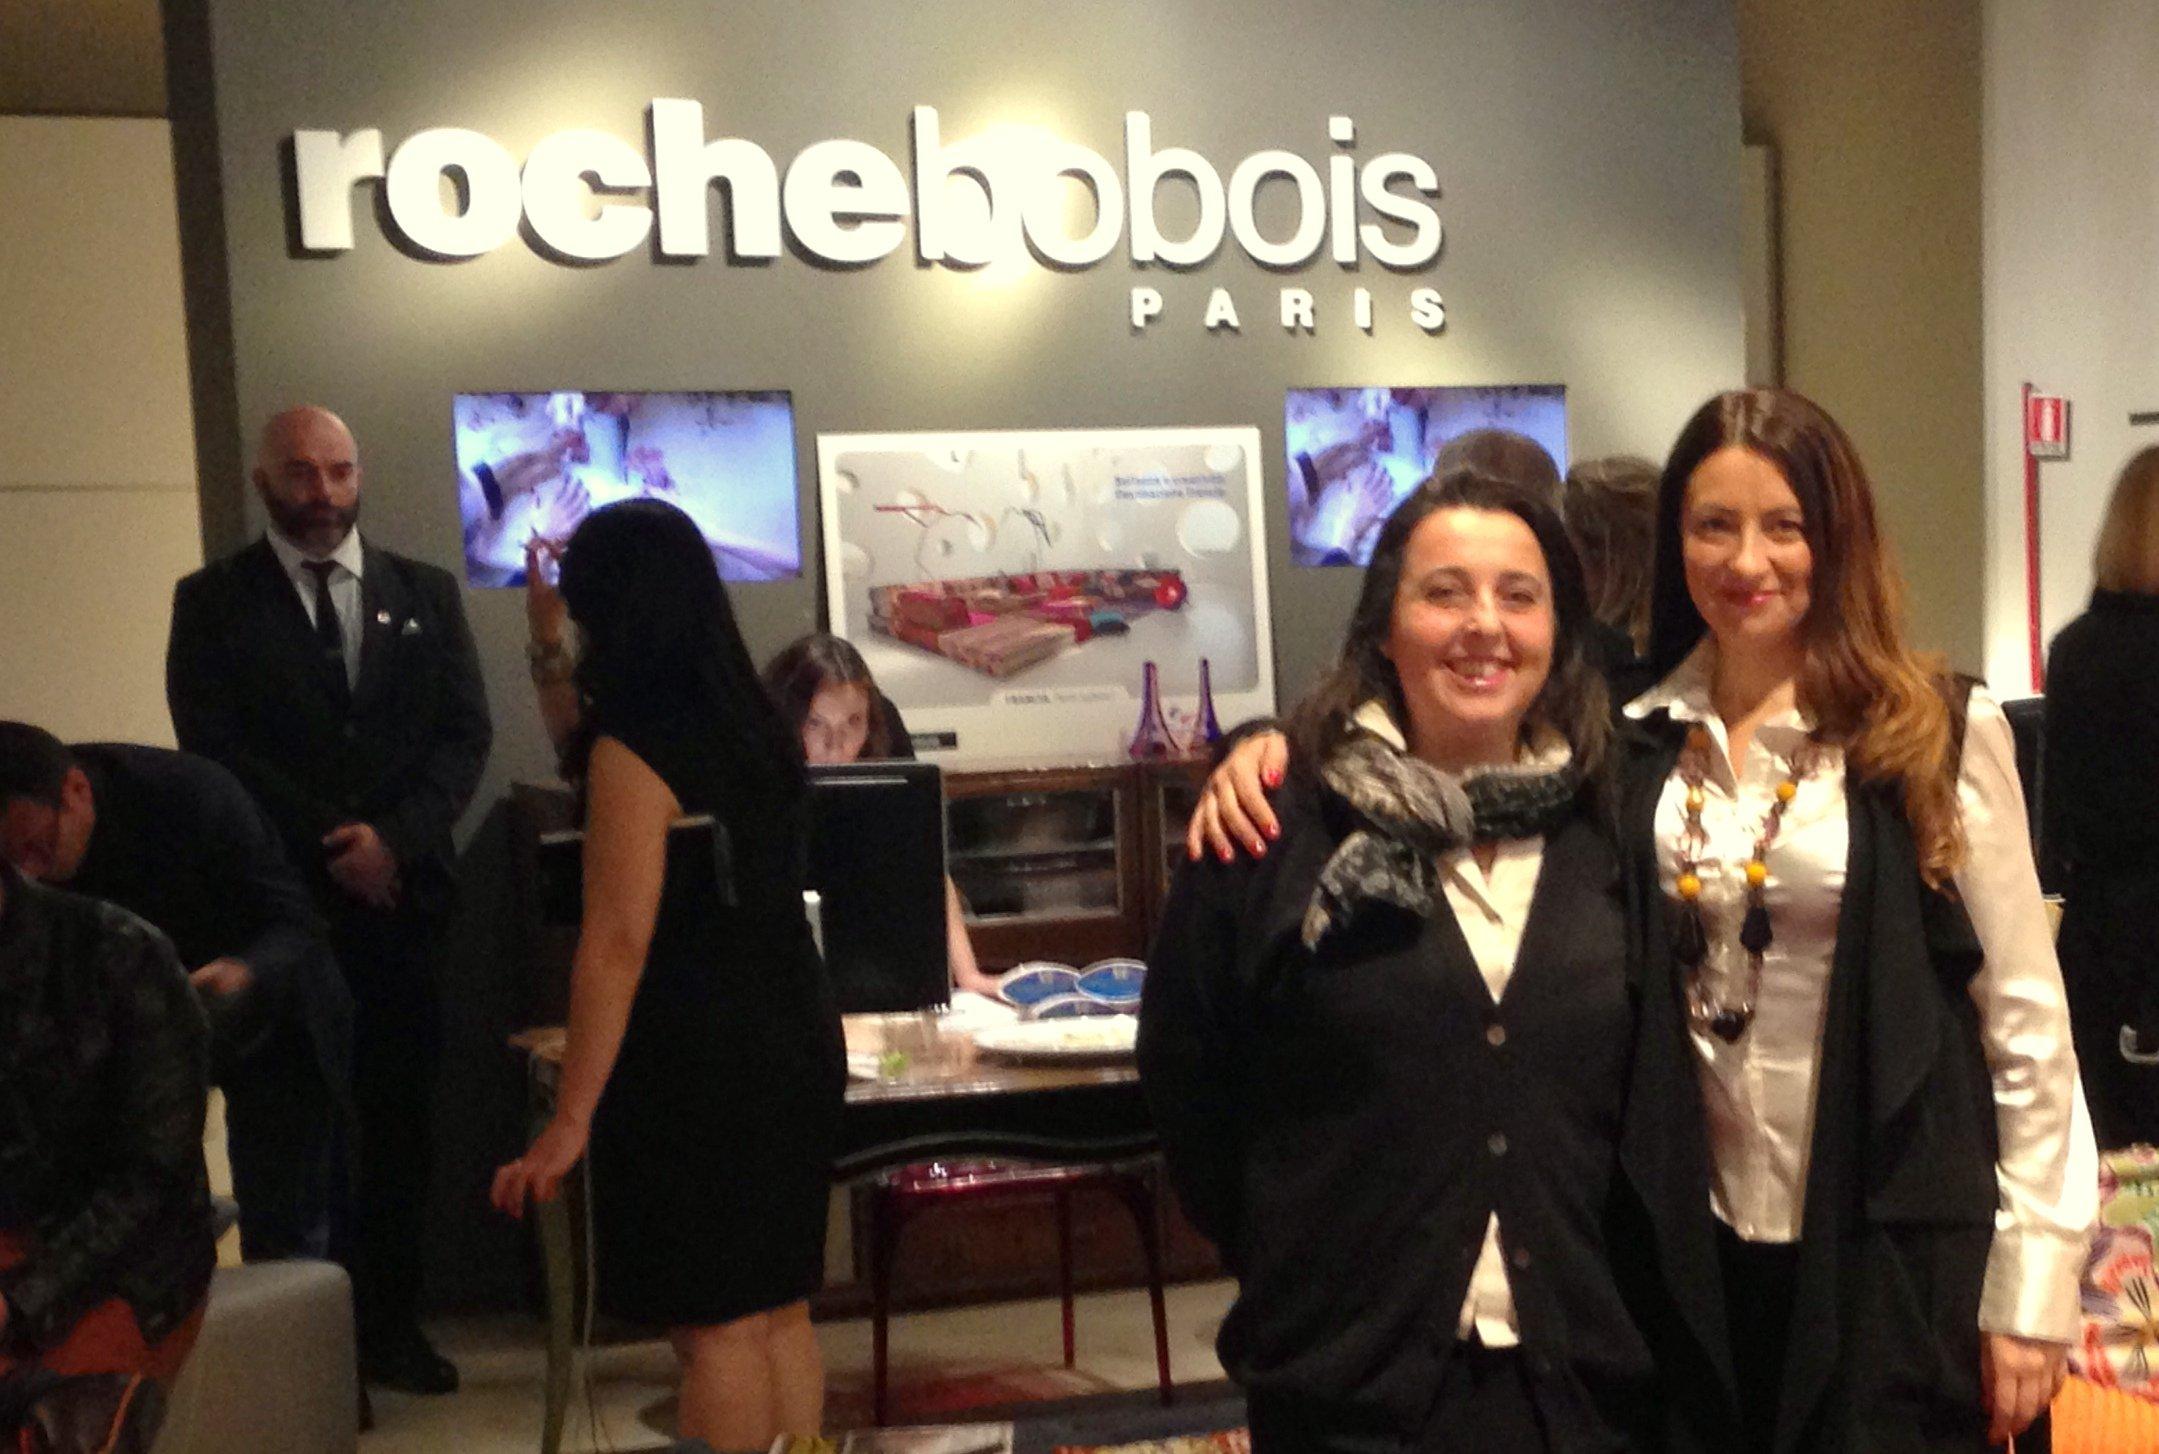 Blog and the City - Lo stile francese a Roma: Buon Compleanno Roche ...